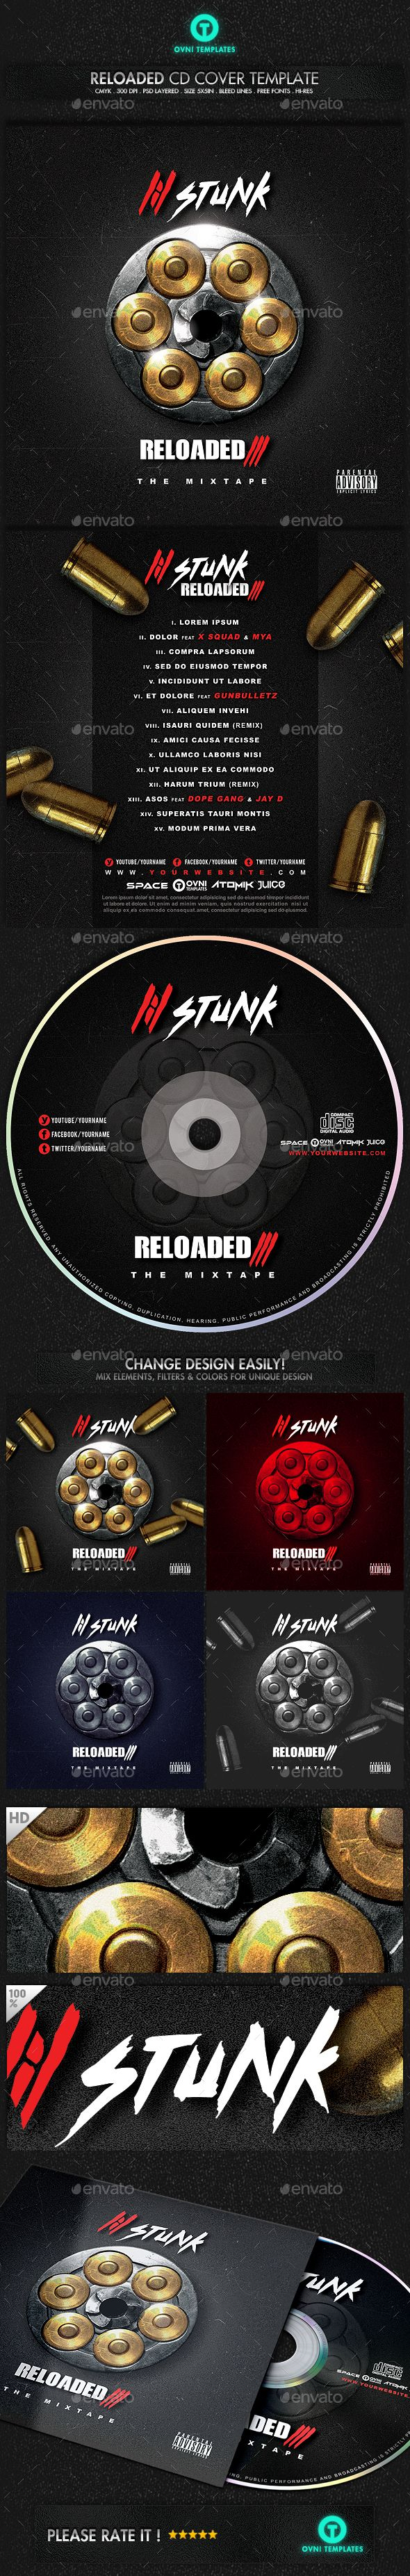 Gun Bullets Urban Hip Hop Rap Mixtape Cover Template PSD. Download here: http://graphicriver.net/item/gun-bullets-urban-hip-hop-rap-mixtape-cover-template/15402434?ref=ksioks